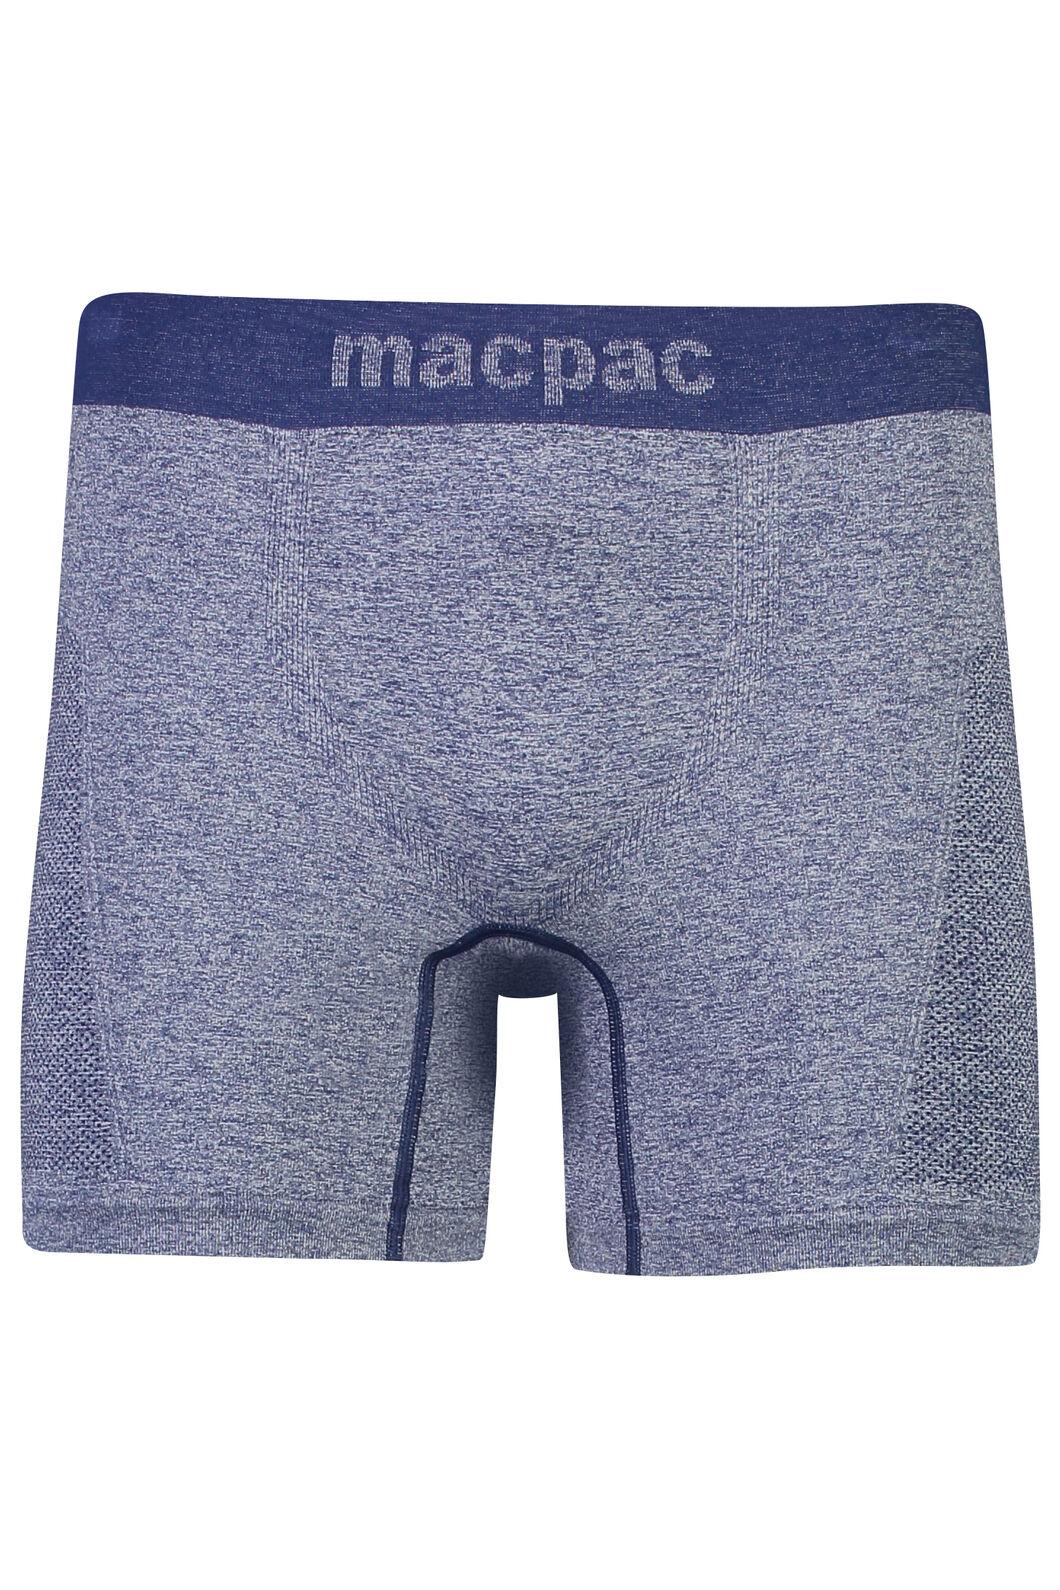 Macpac Limitless Boxers - Men's, Medieval Blue, hi-res